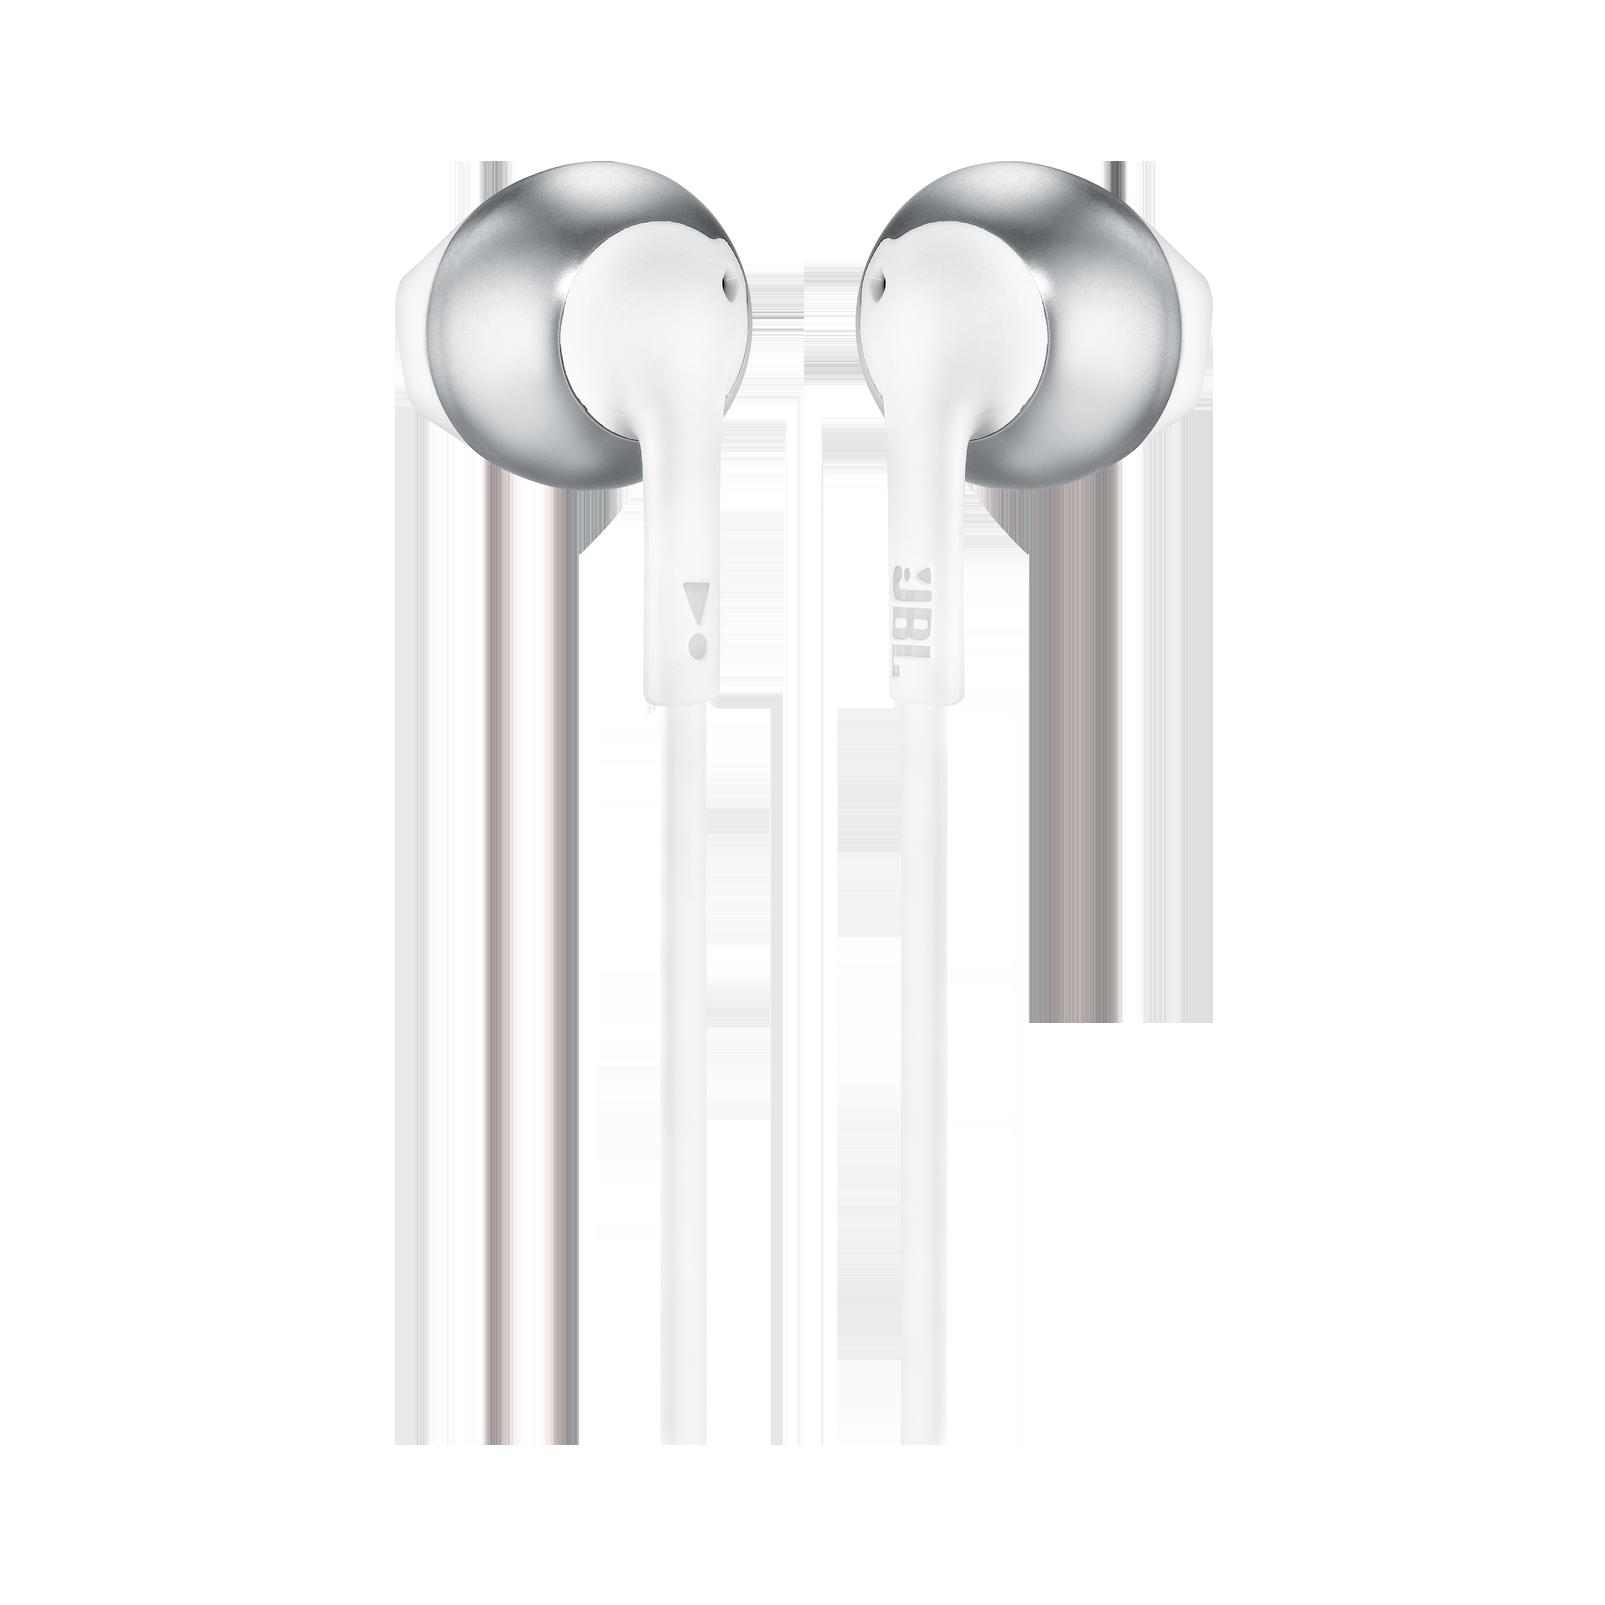 JBL TUNE 205 - Chrome - Earbud headphones - Back